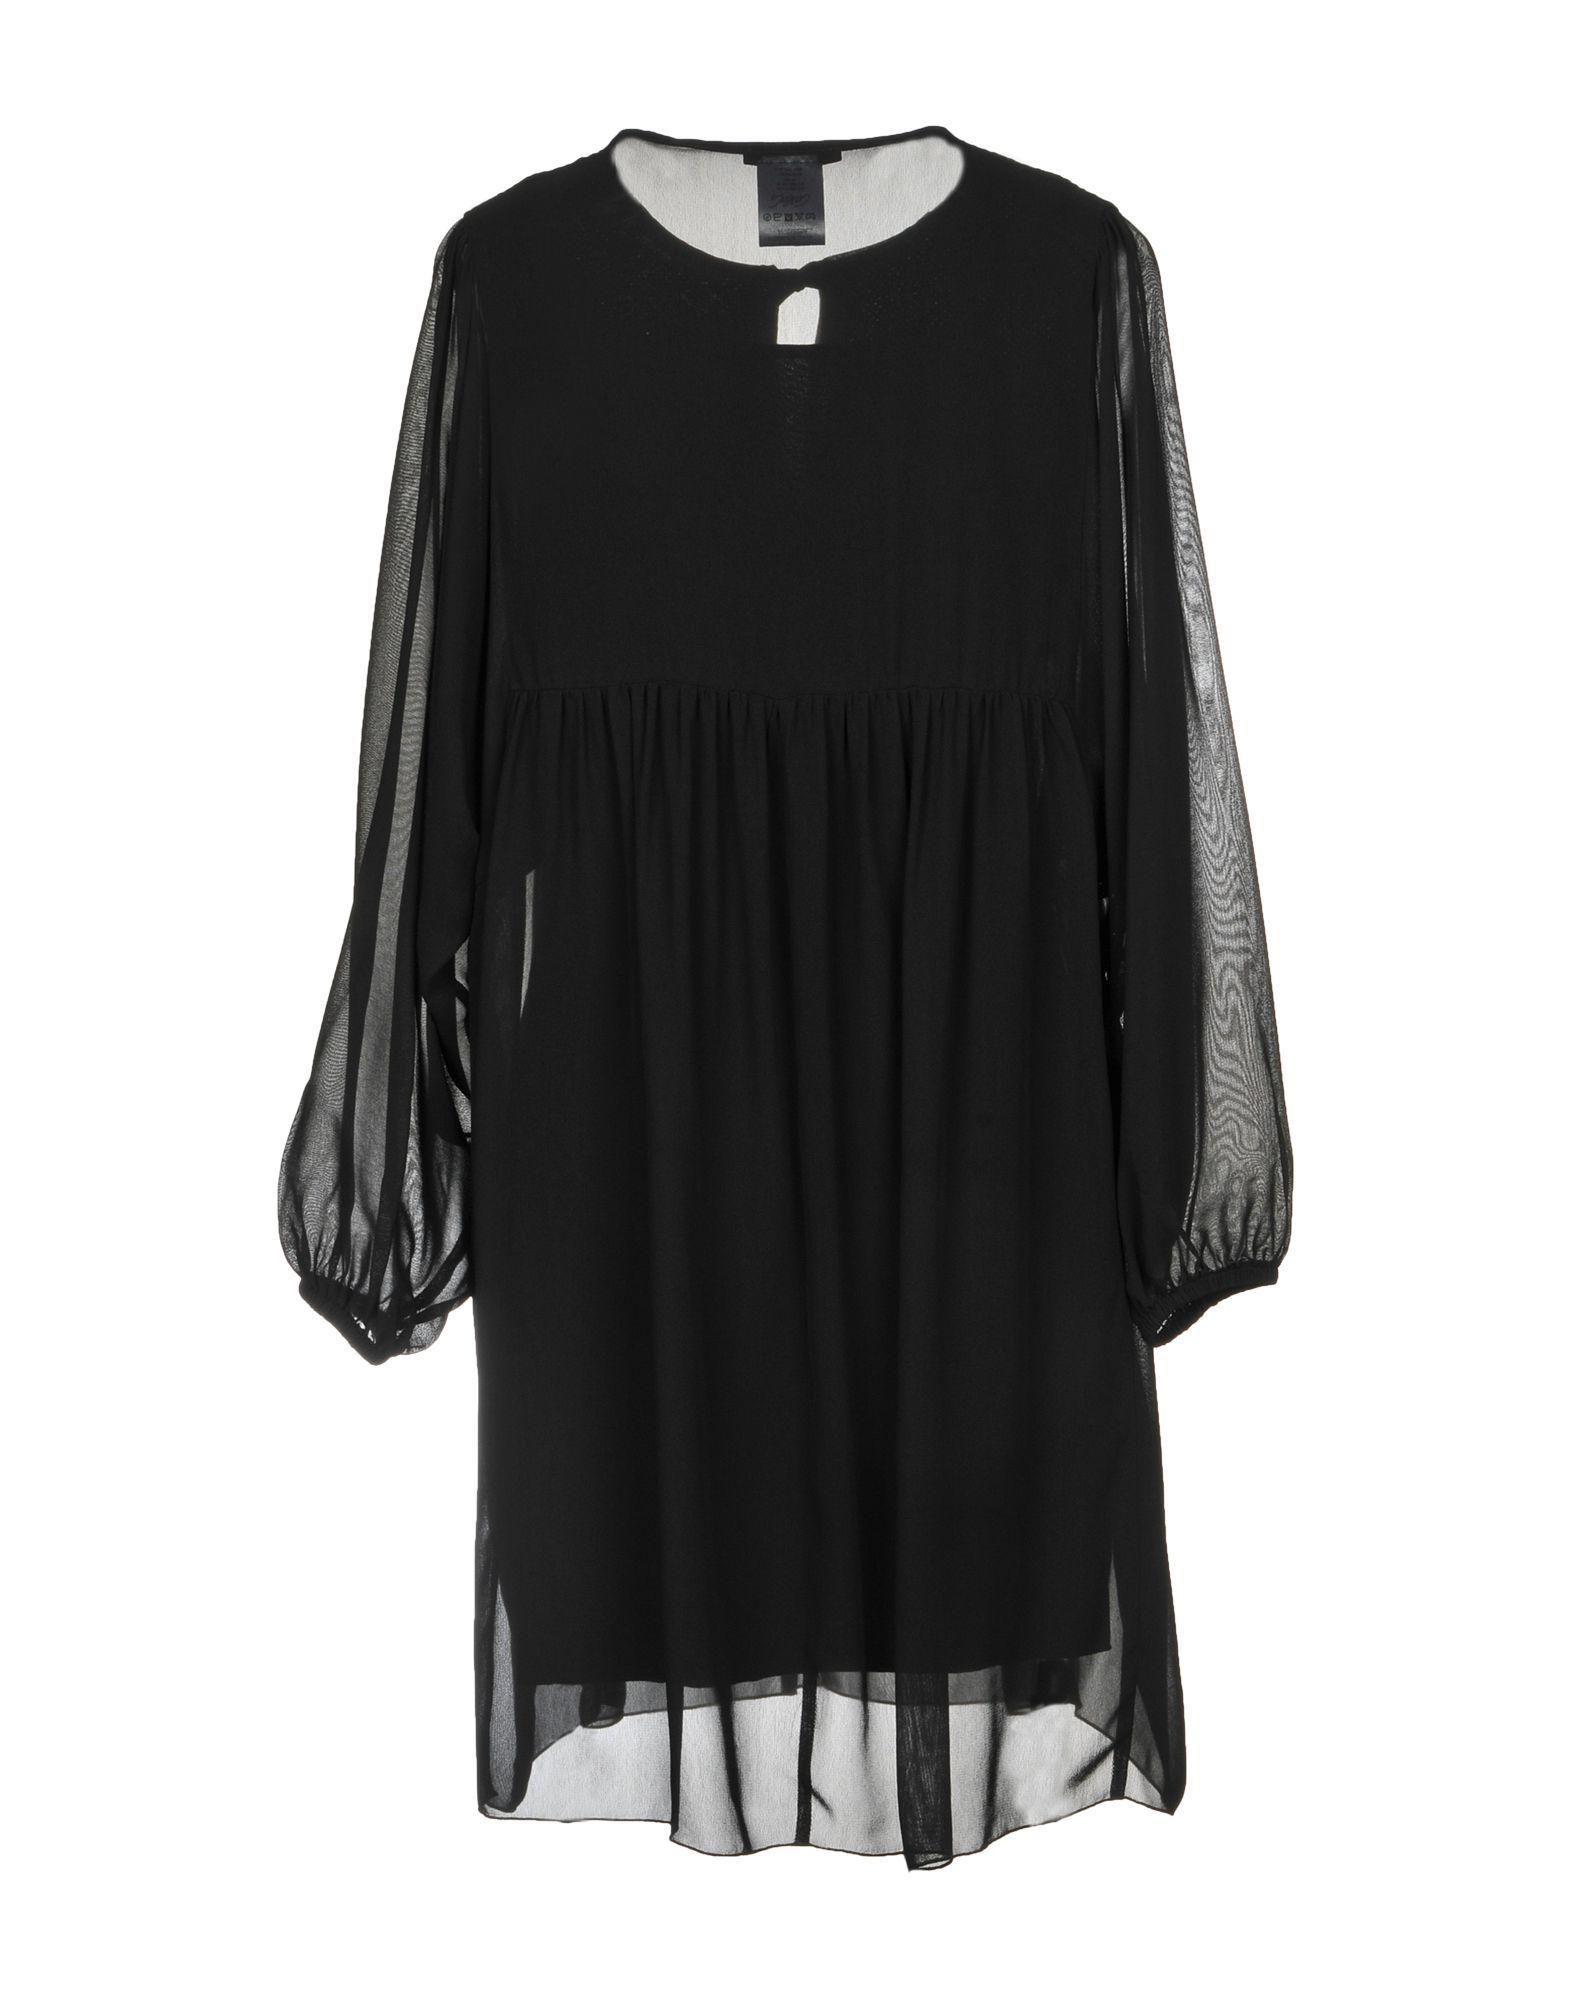 DRESSES Carla G. Black Woman Viscose